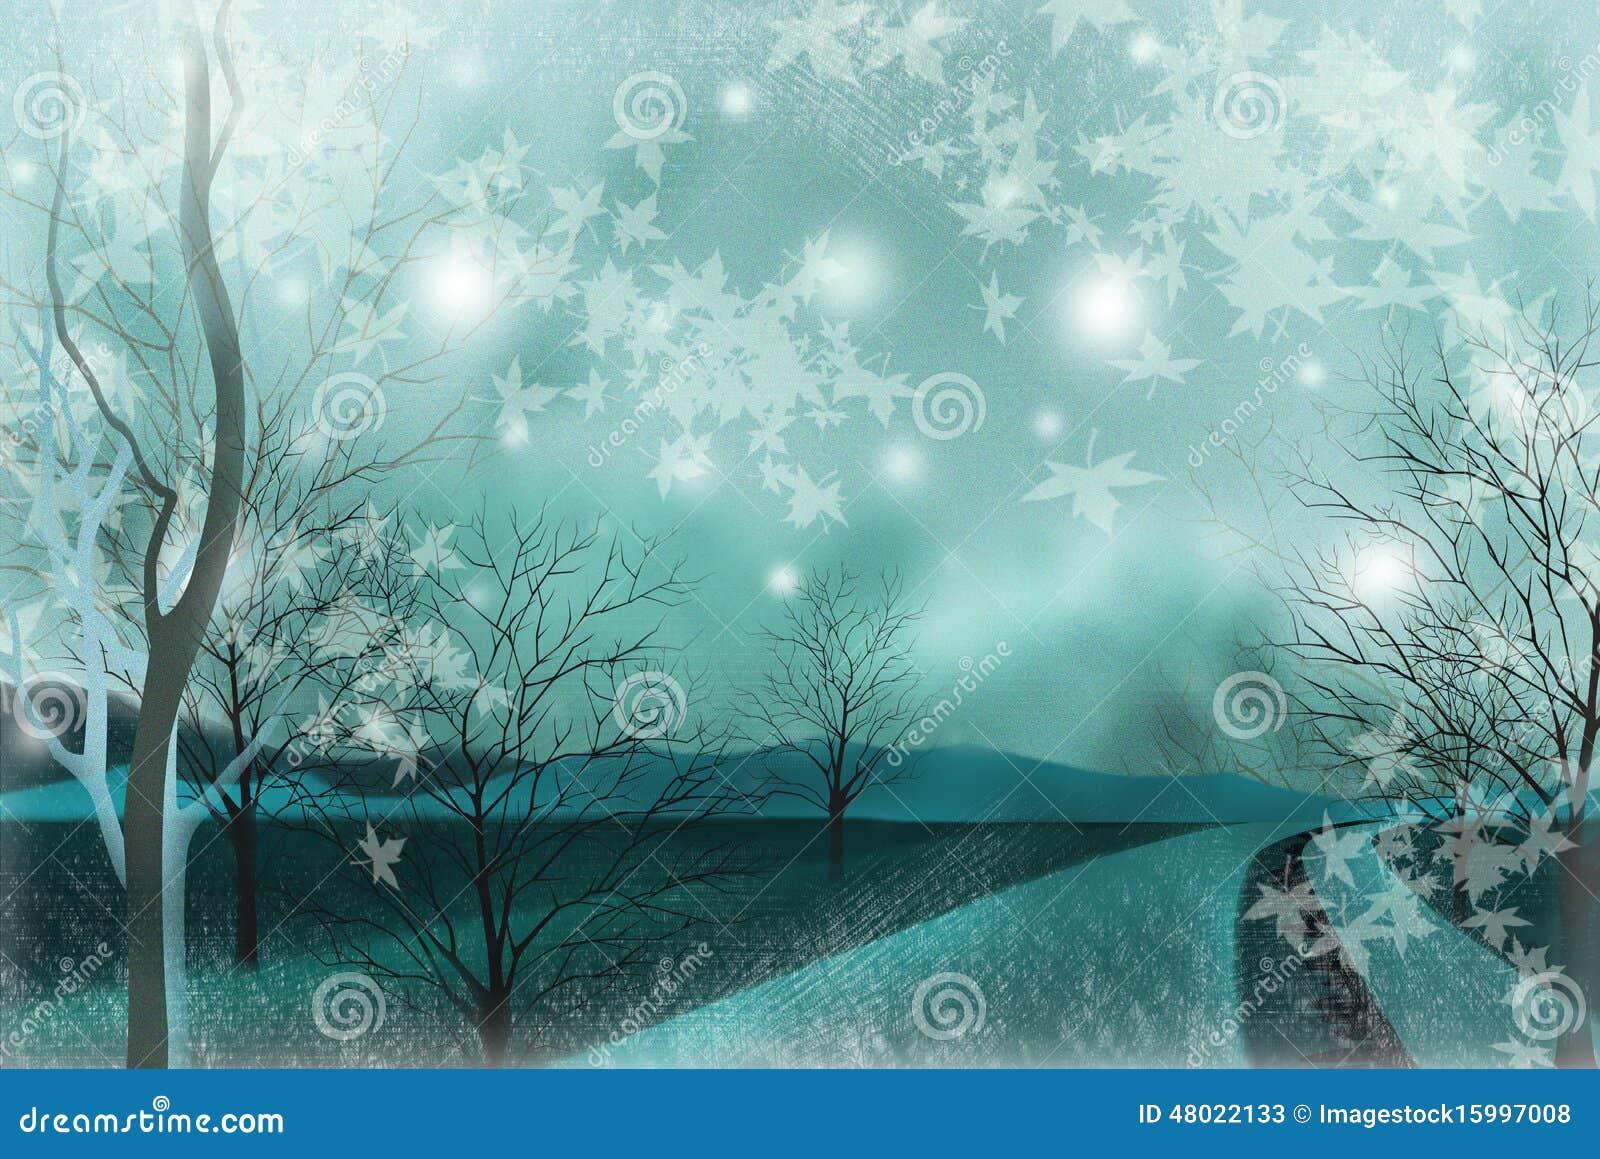 Wiejski krajobraz półmrok - Graficzna obraz tekstura